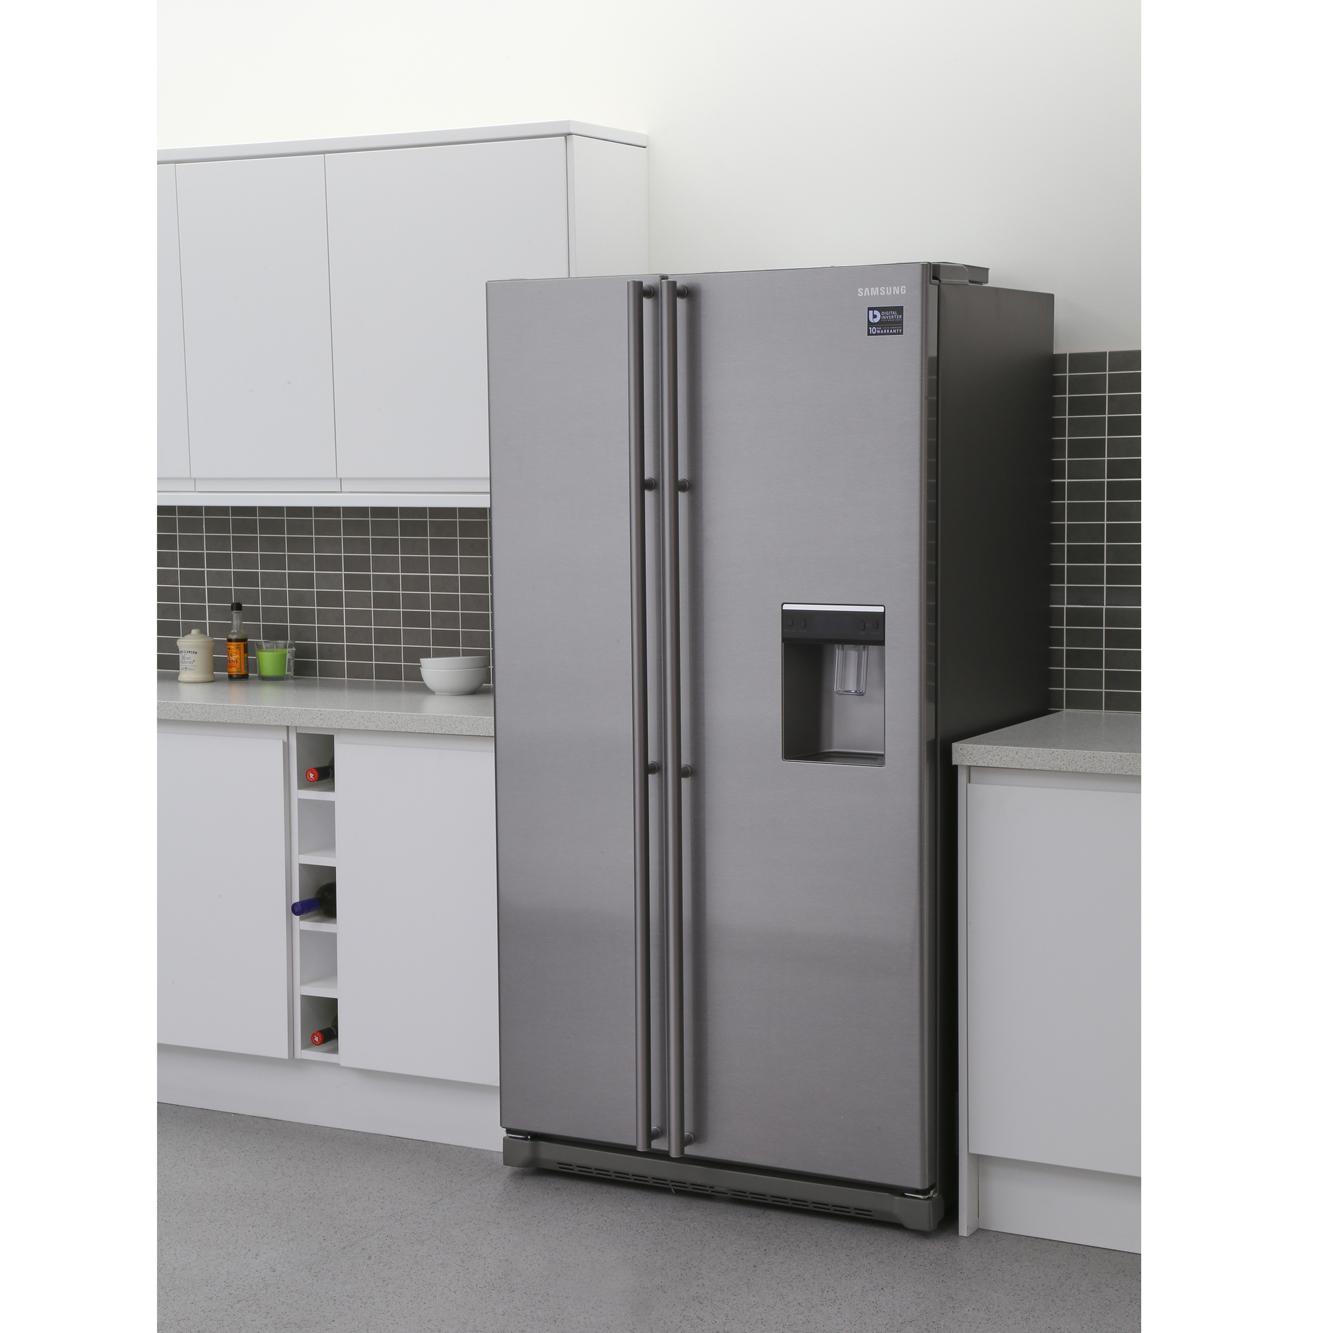 samsung fridge freezer. samsung rsa1rtmg1 american fridge freezer